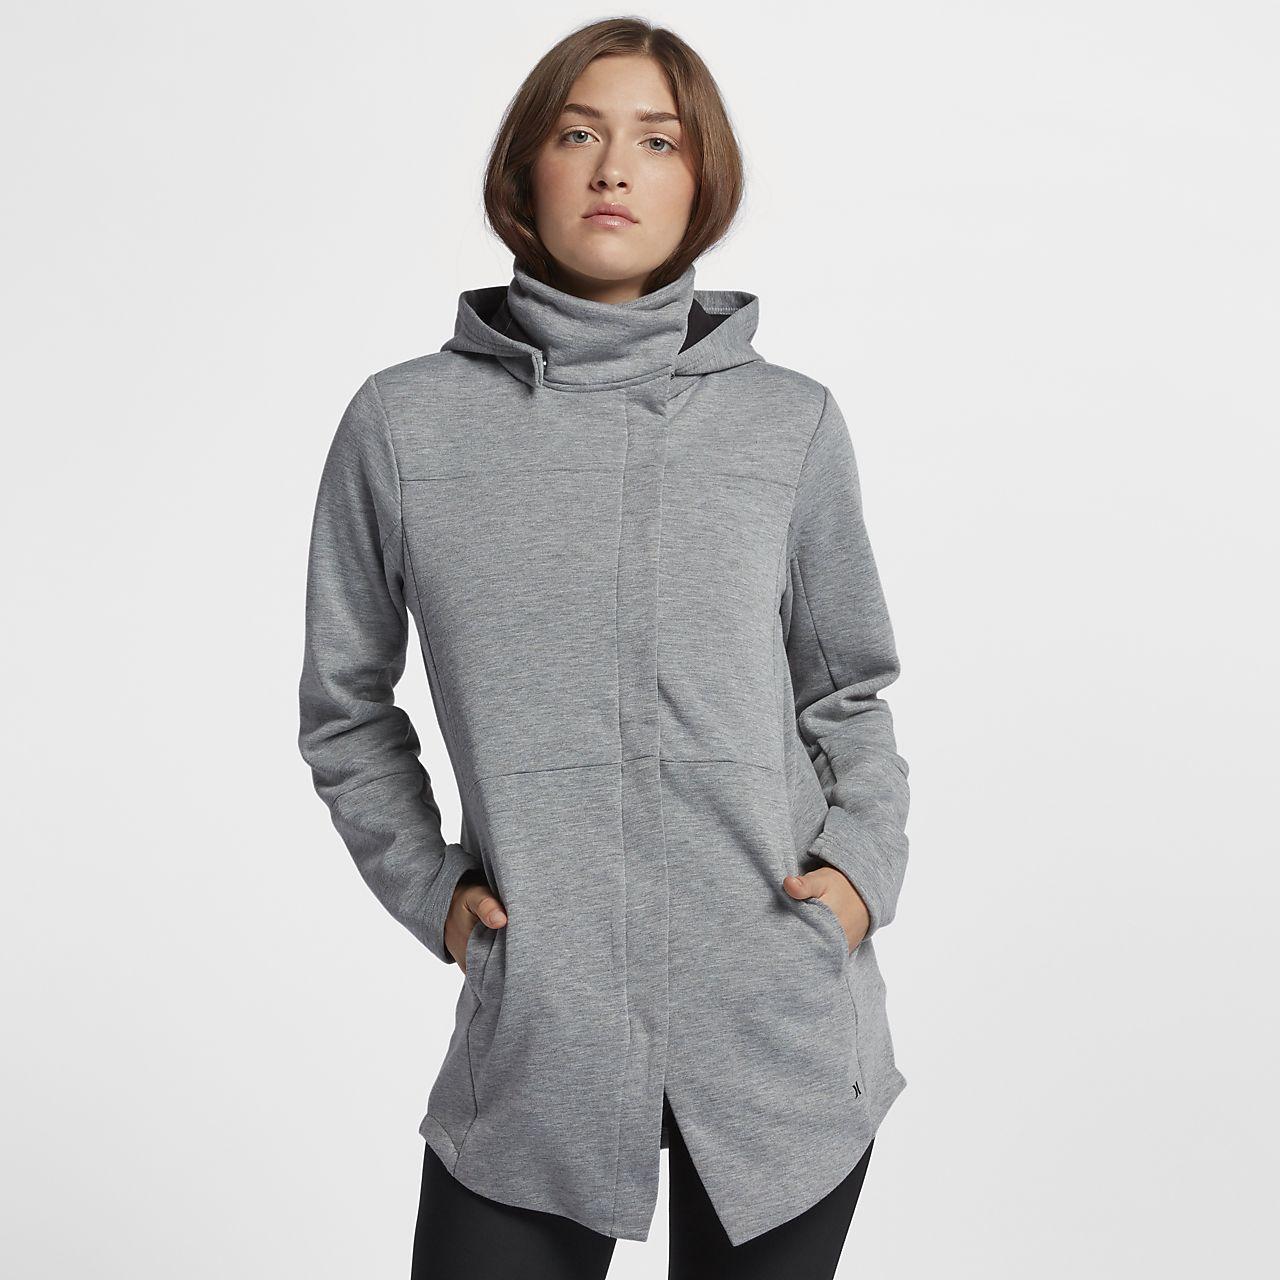 6e648174394 Hurley Therma Winchester Women s Fleece Jacket. Nike.com NZ